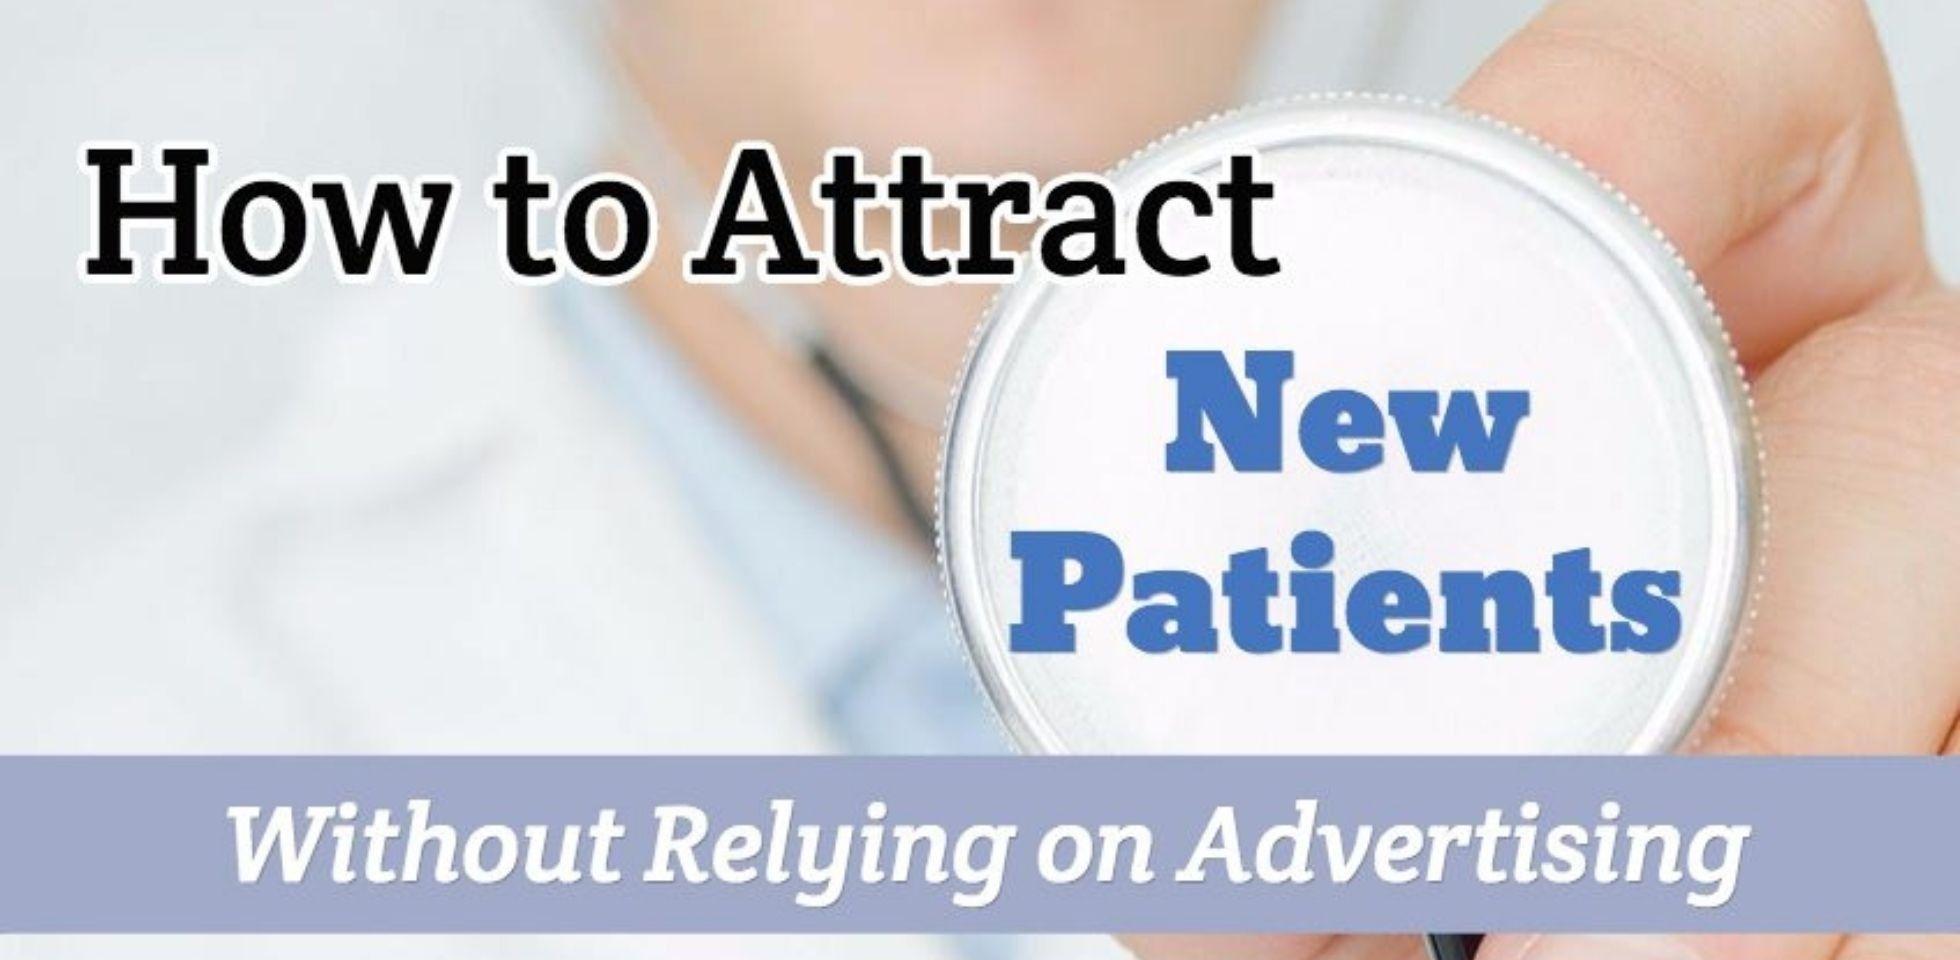 Creative ways to increase patient volume